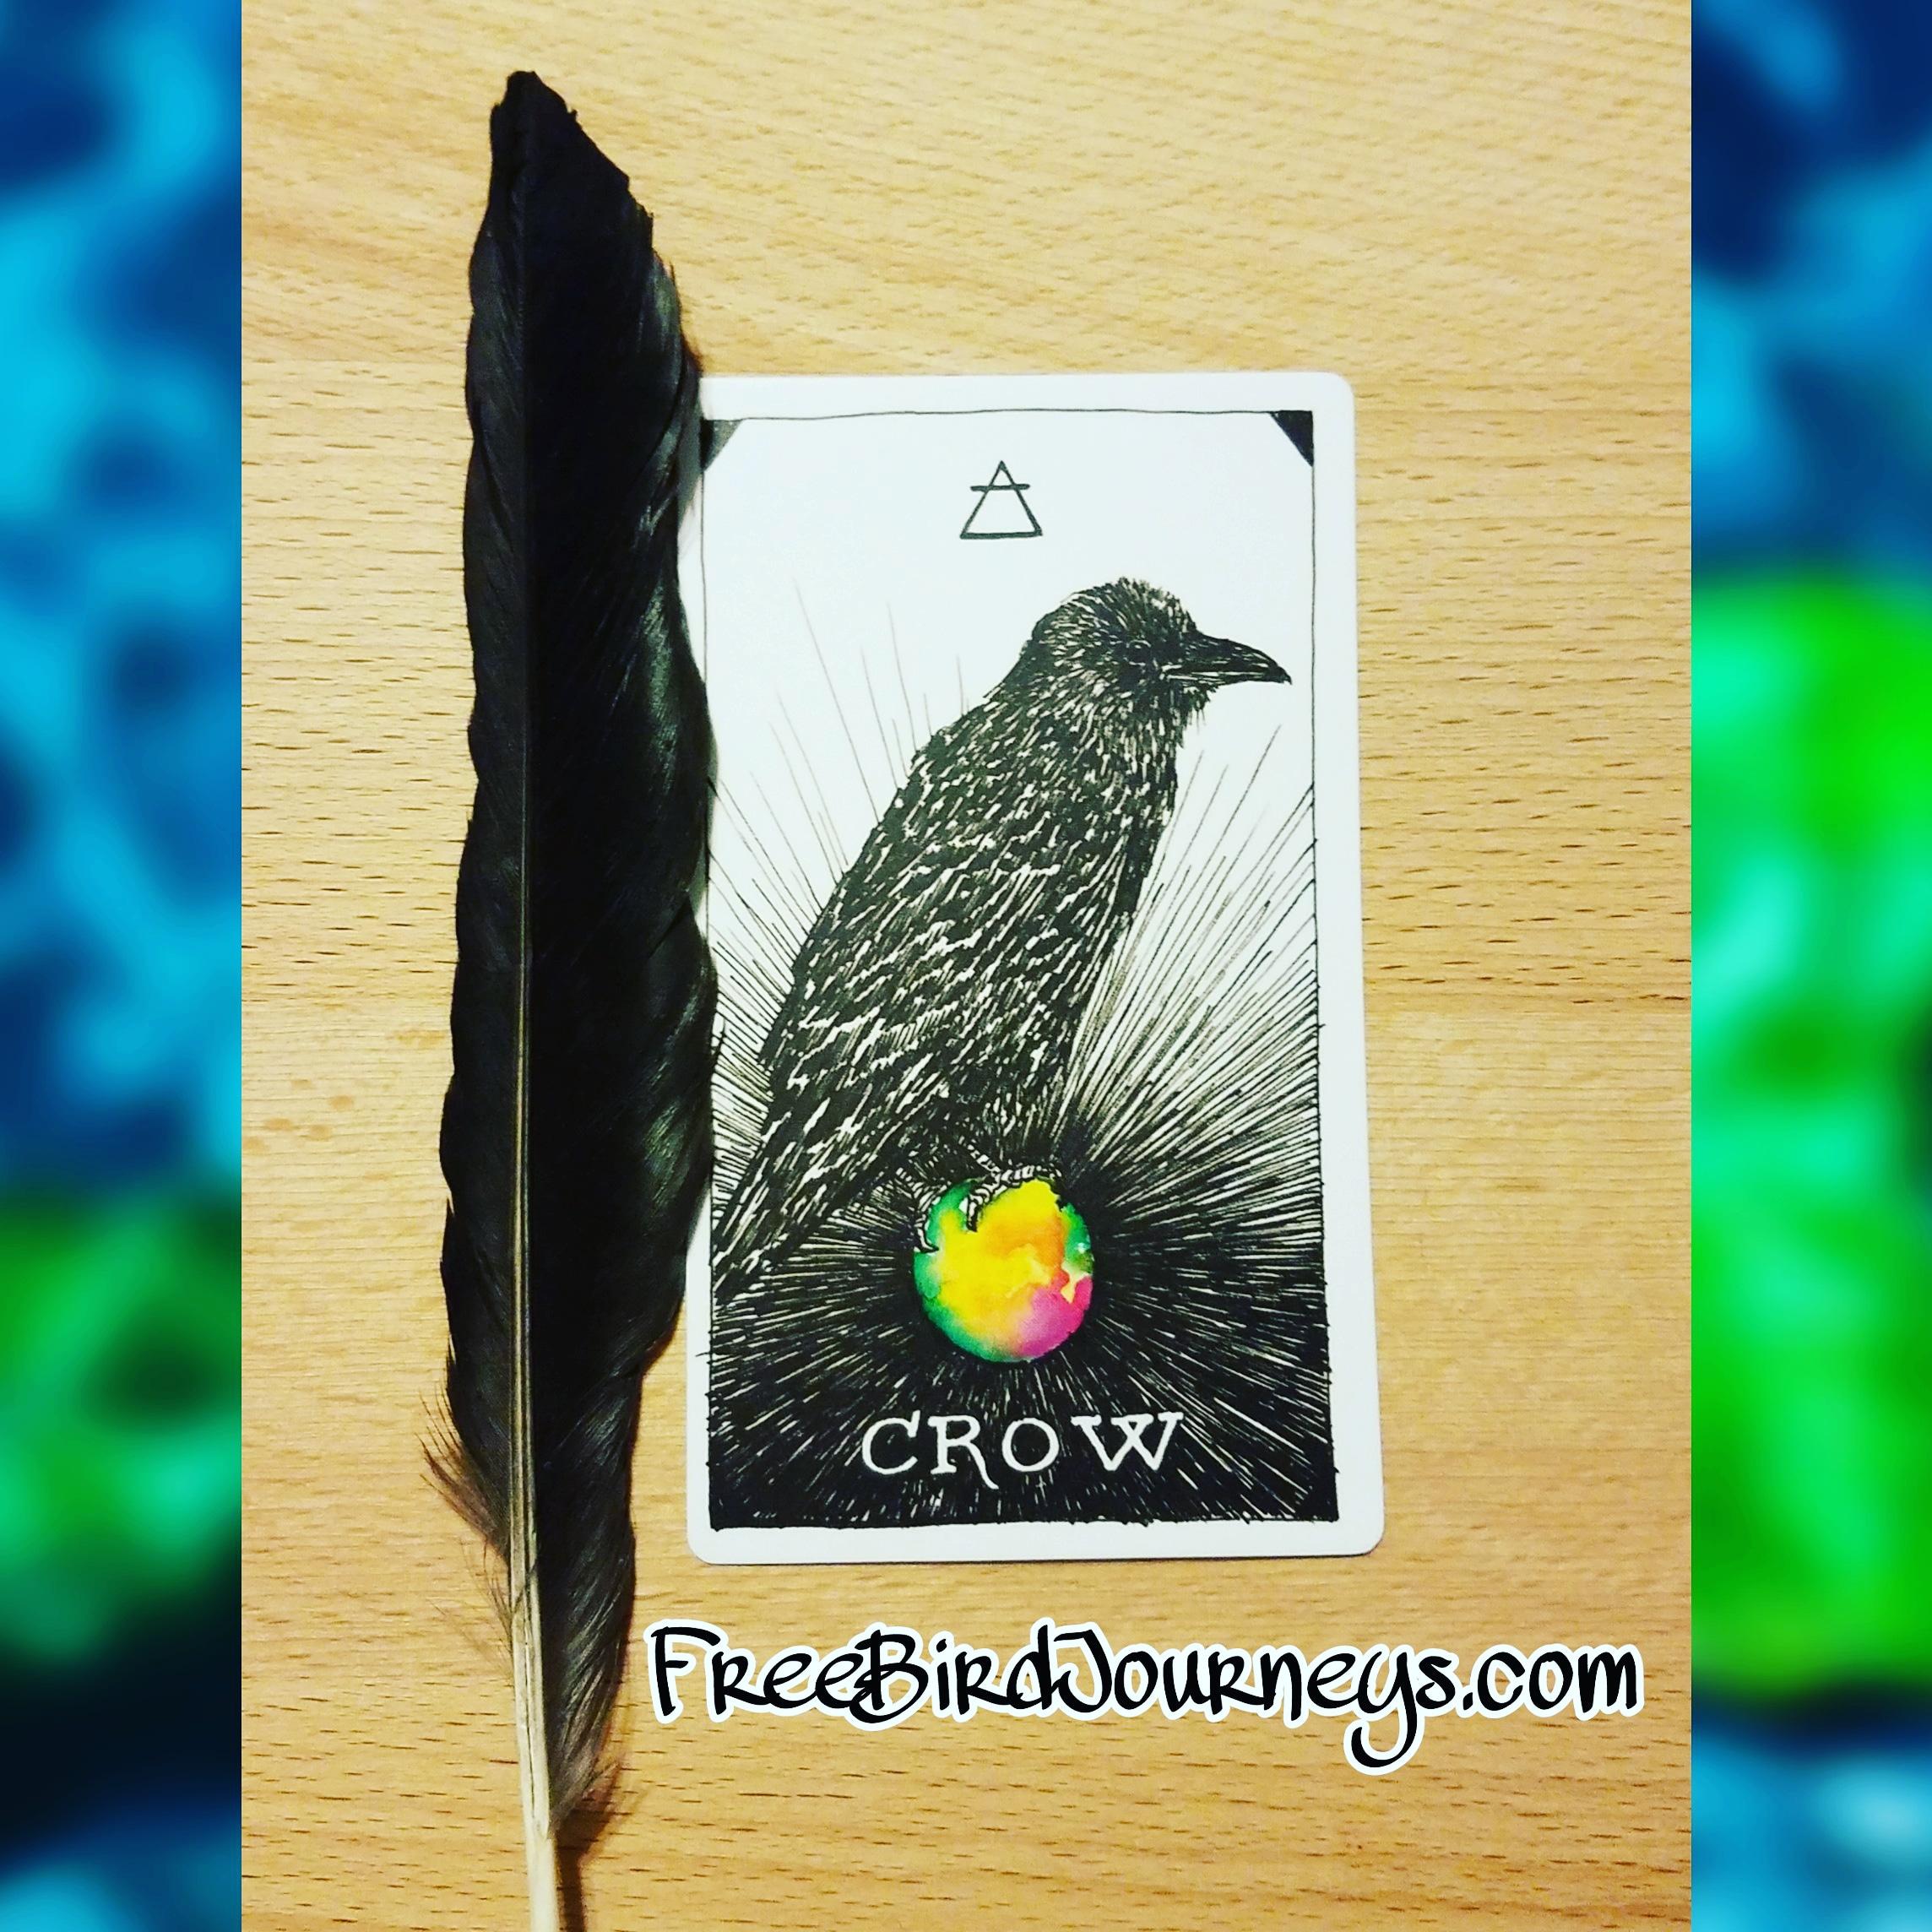 Crow2018.jpg